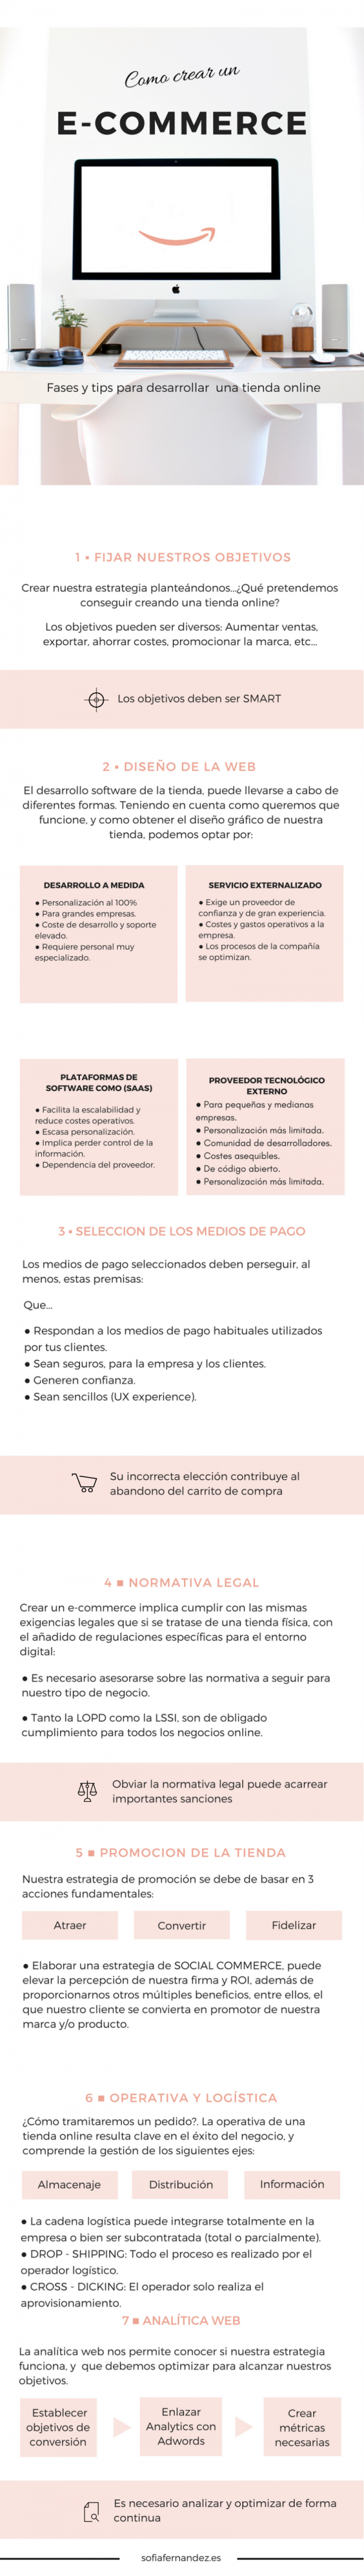 infografía consejos para la creación de un e-commerce | Sofía ...